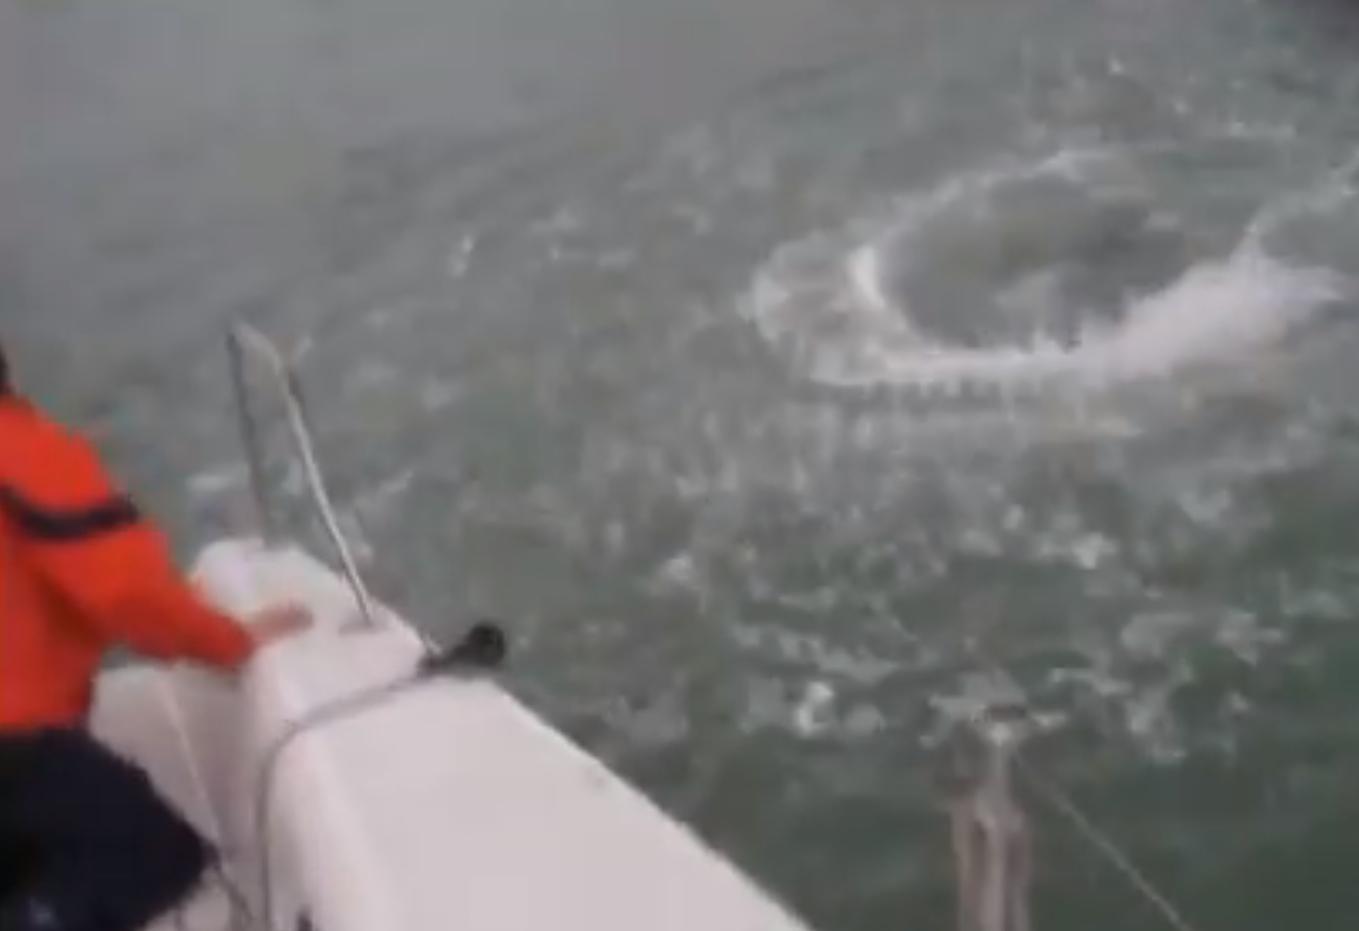 Torqeedo outboard motor boat fail